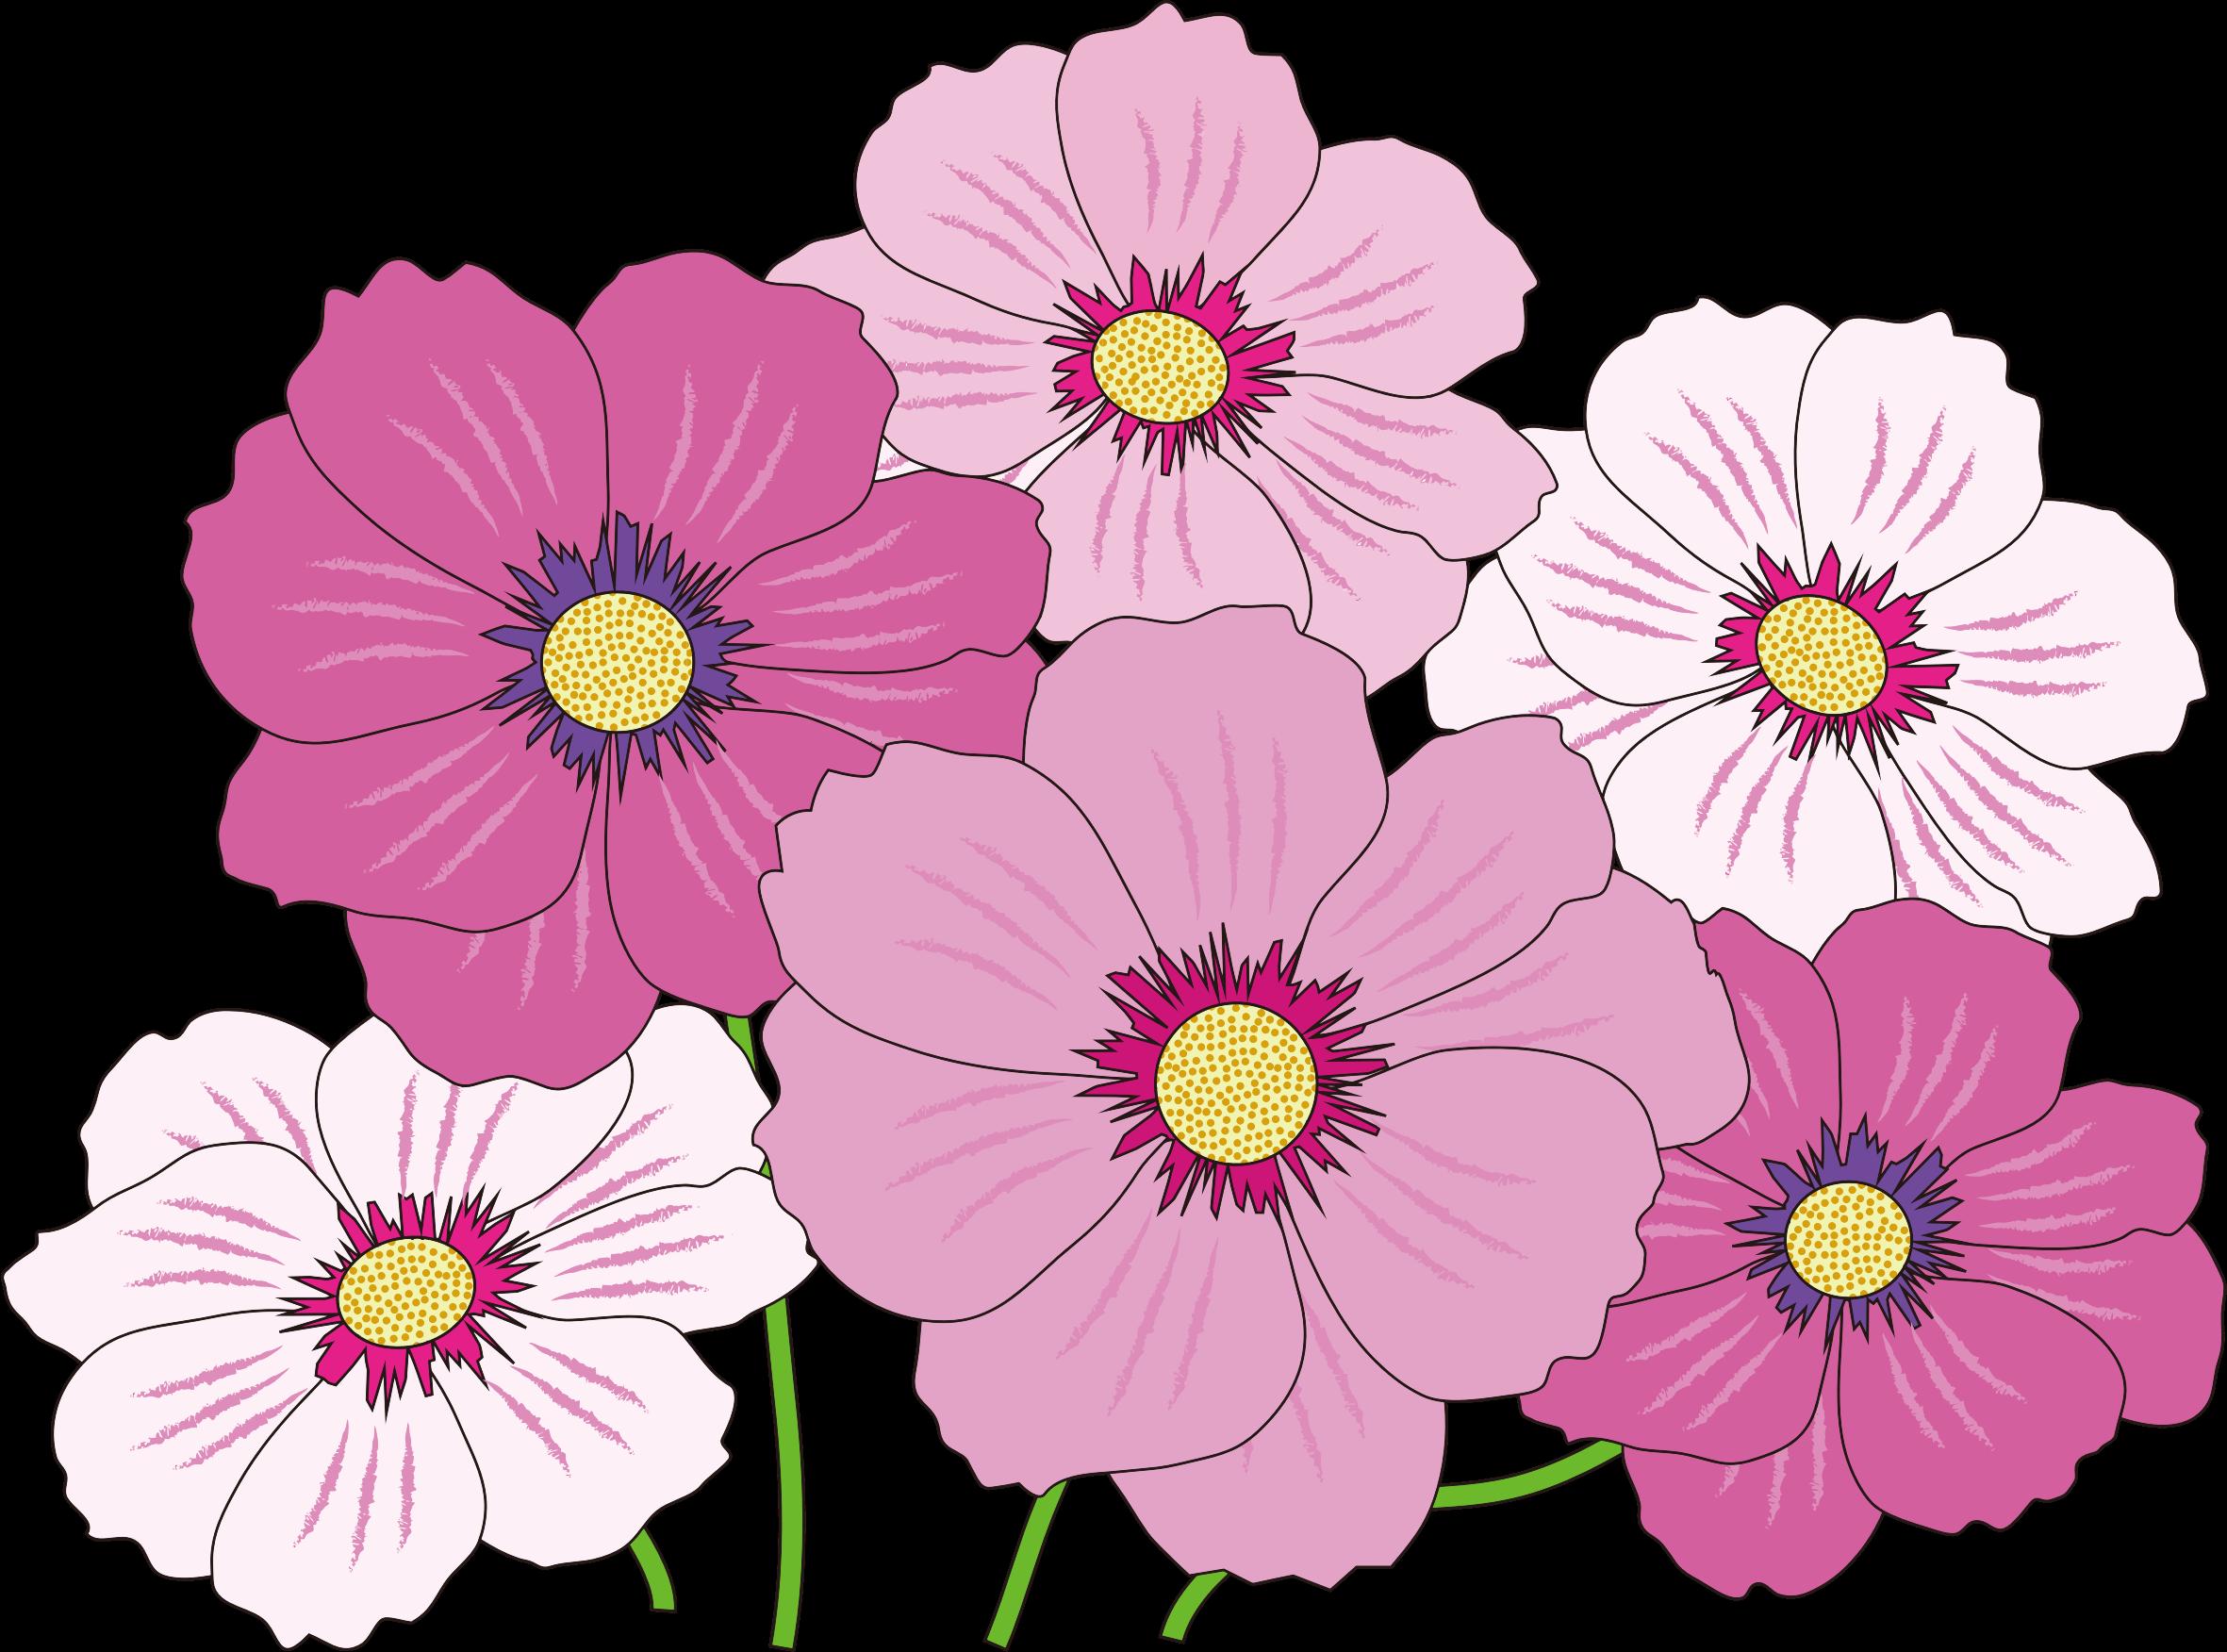 jpg royalty free Daisies grassy frames illustrations. Mango clipart flower